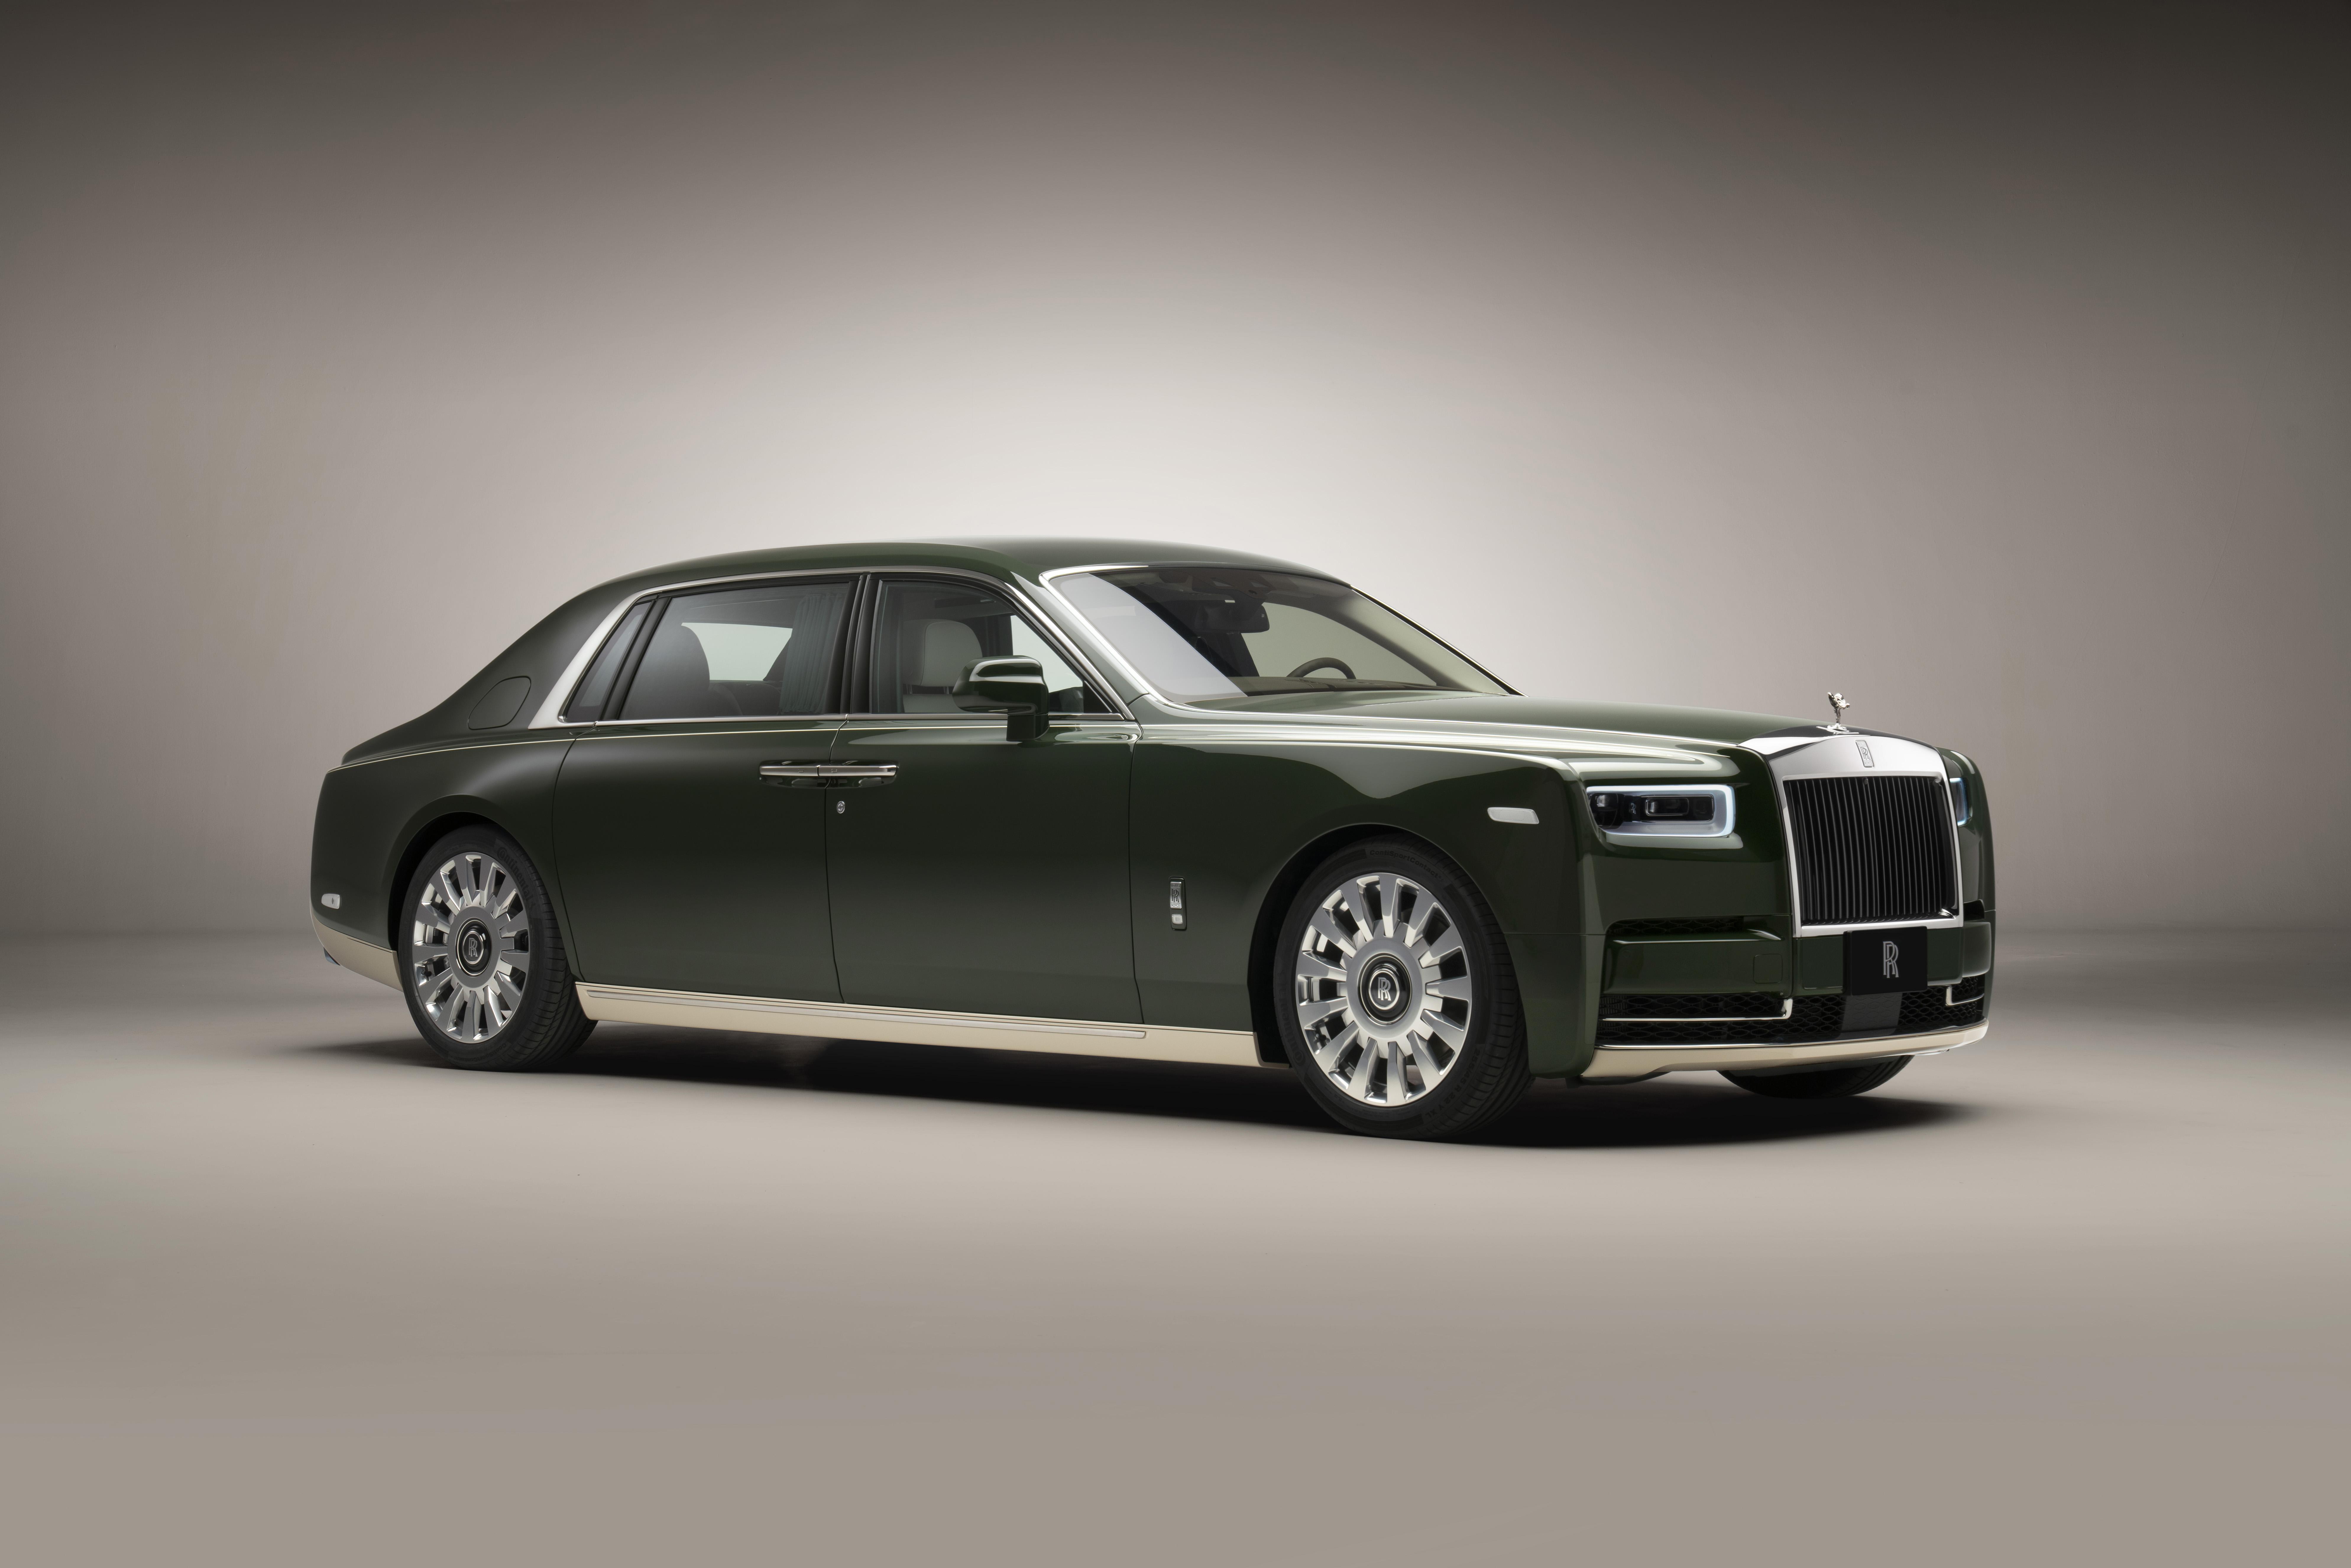 The bespoke Phantom Oribe created by Rolls-Royce and Hermès.